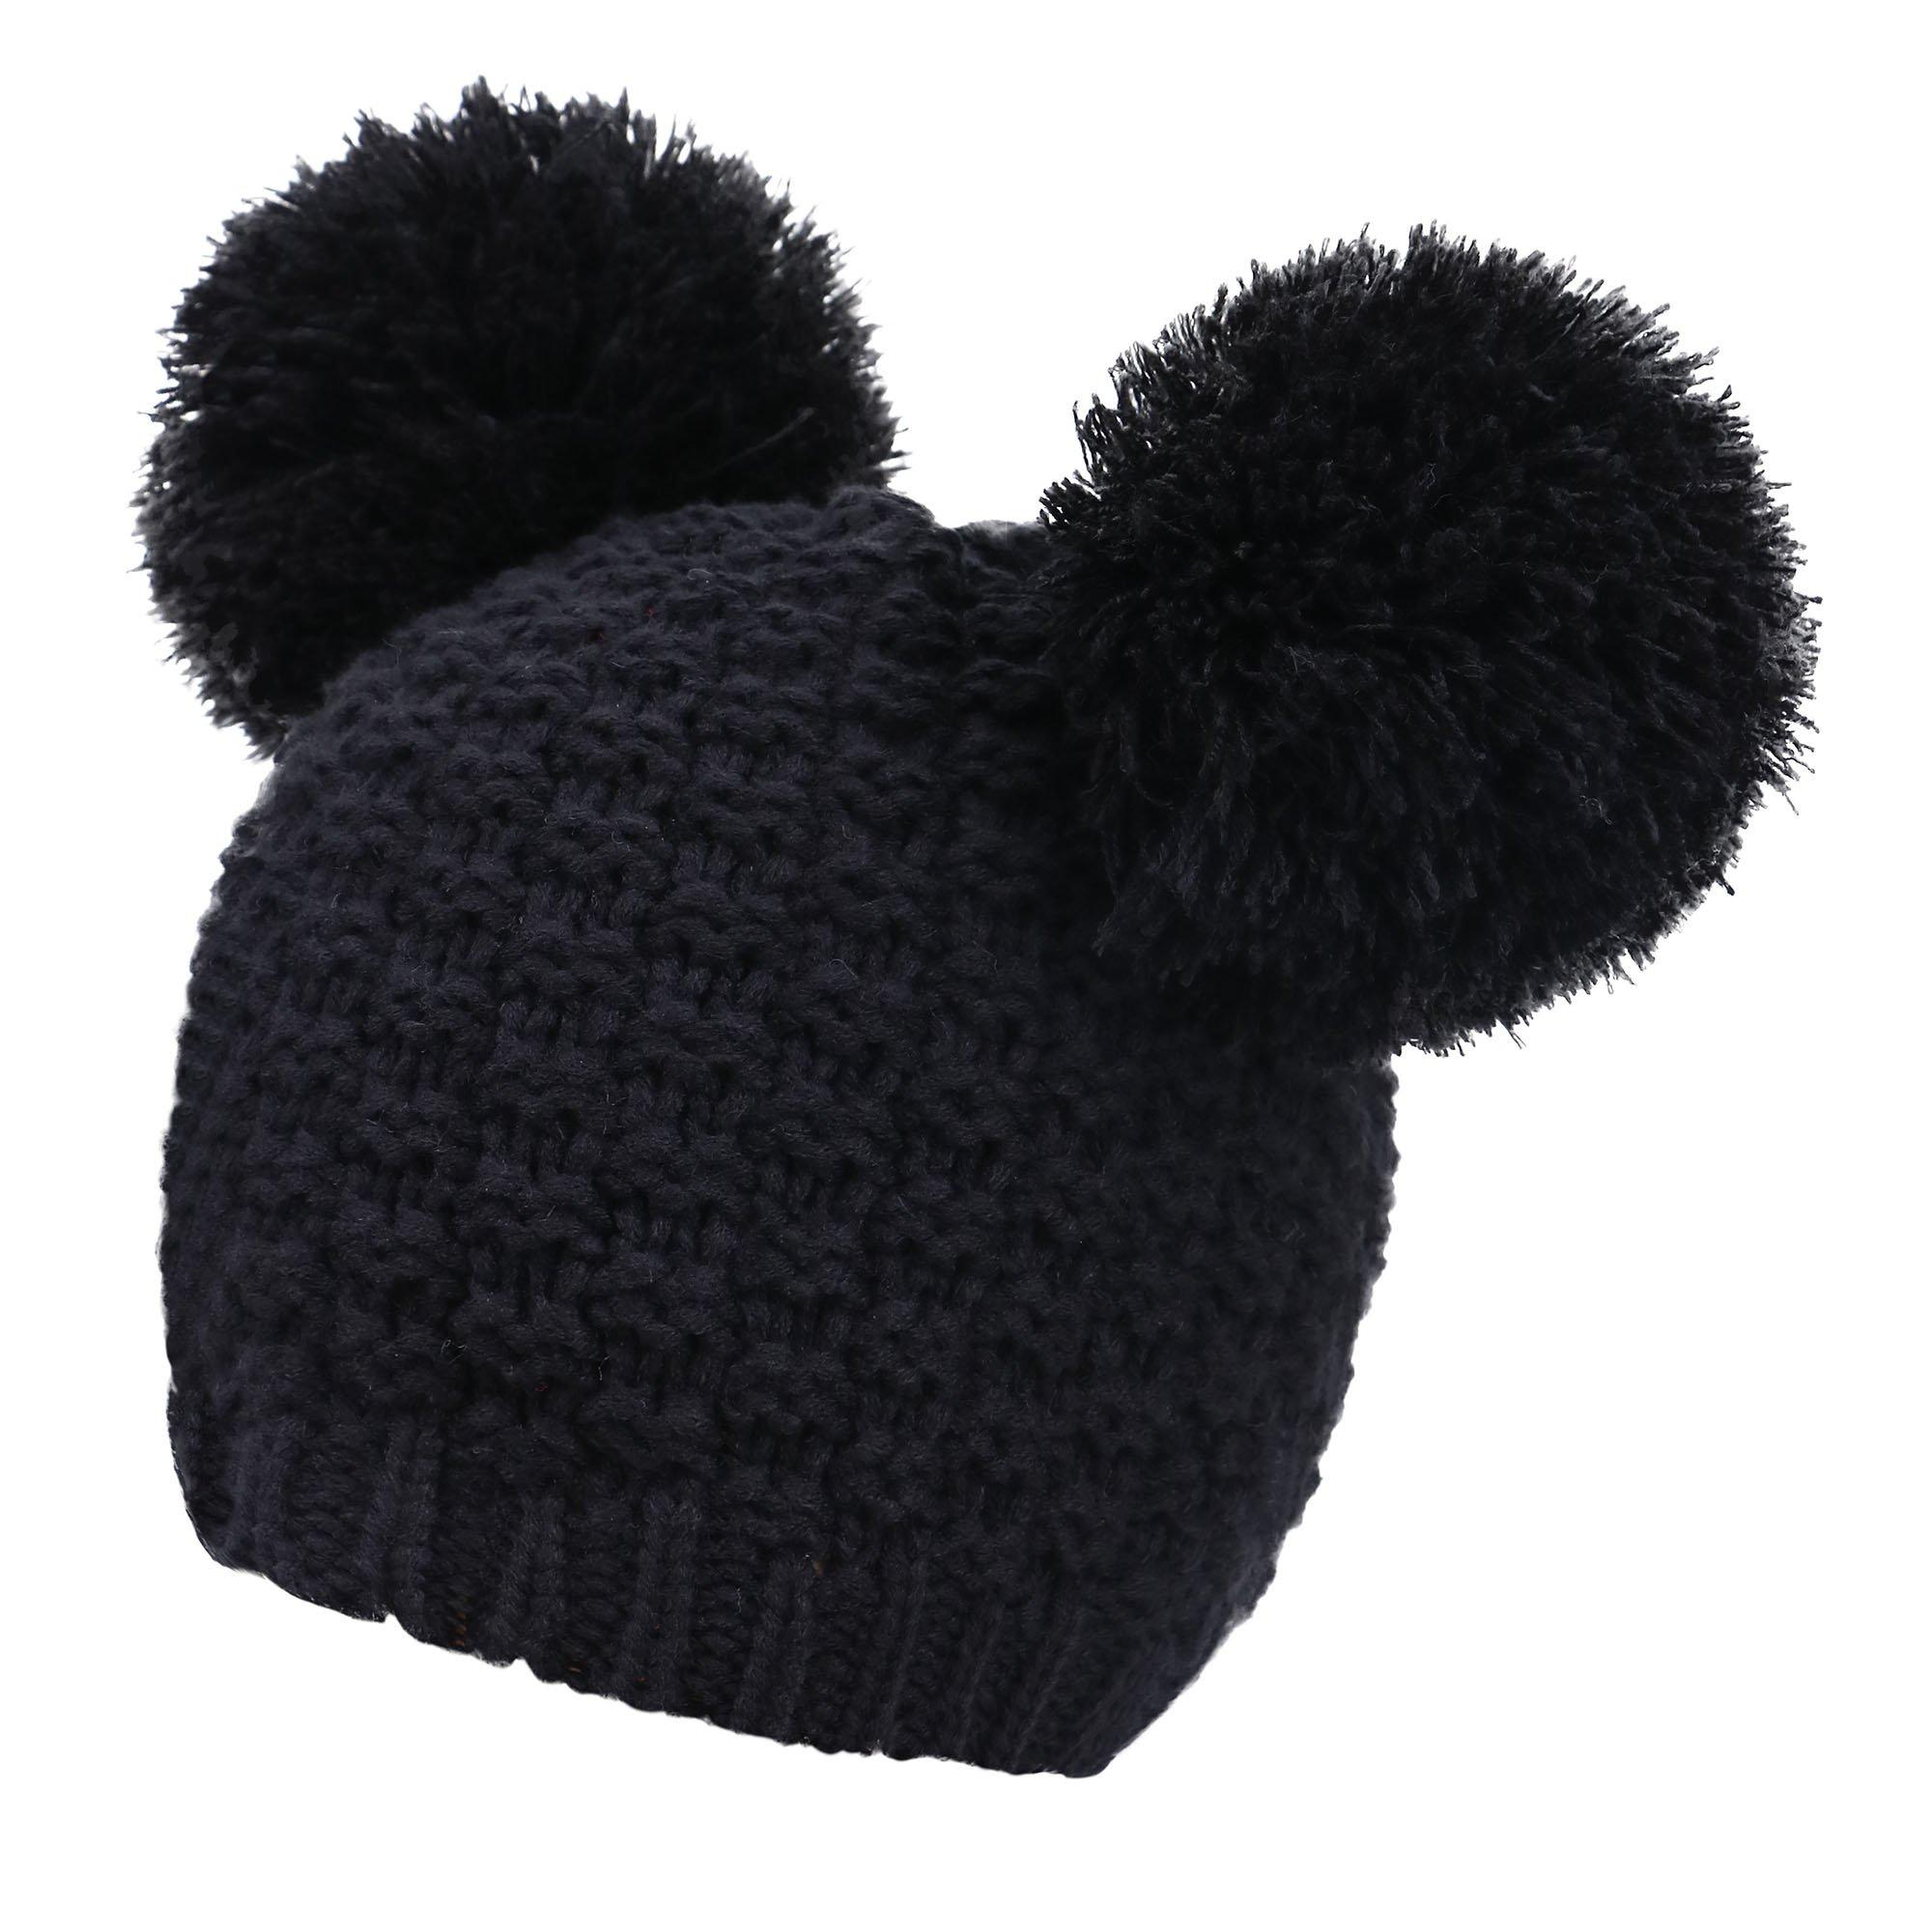 Livingston Women's Winter Chunky Knit Double Pom Pom Beanie Hat, Black